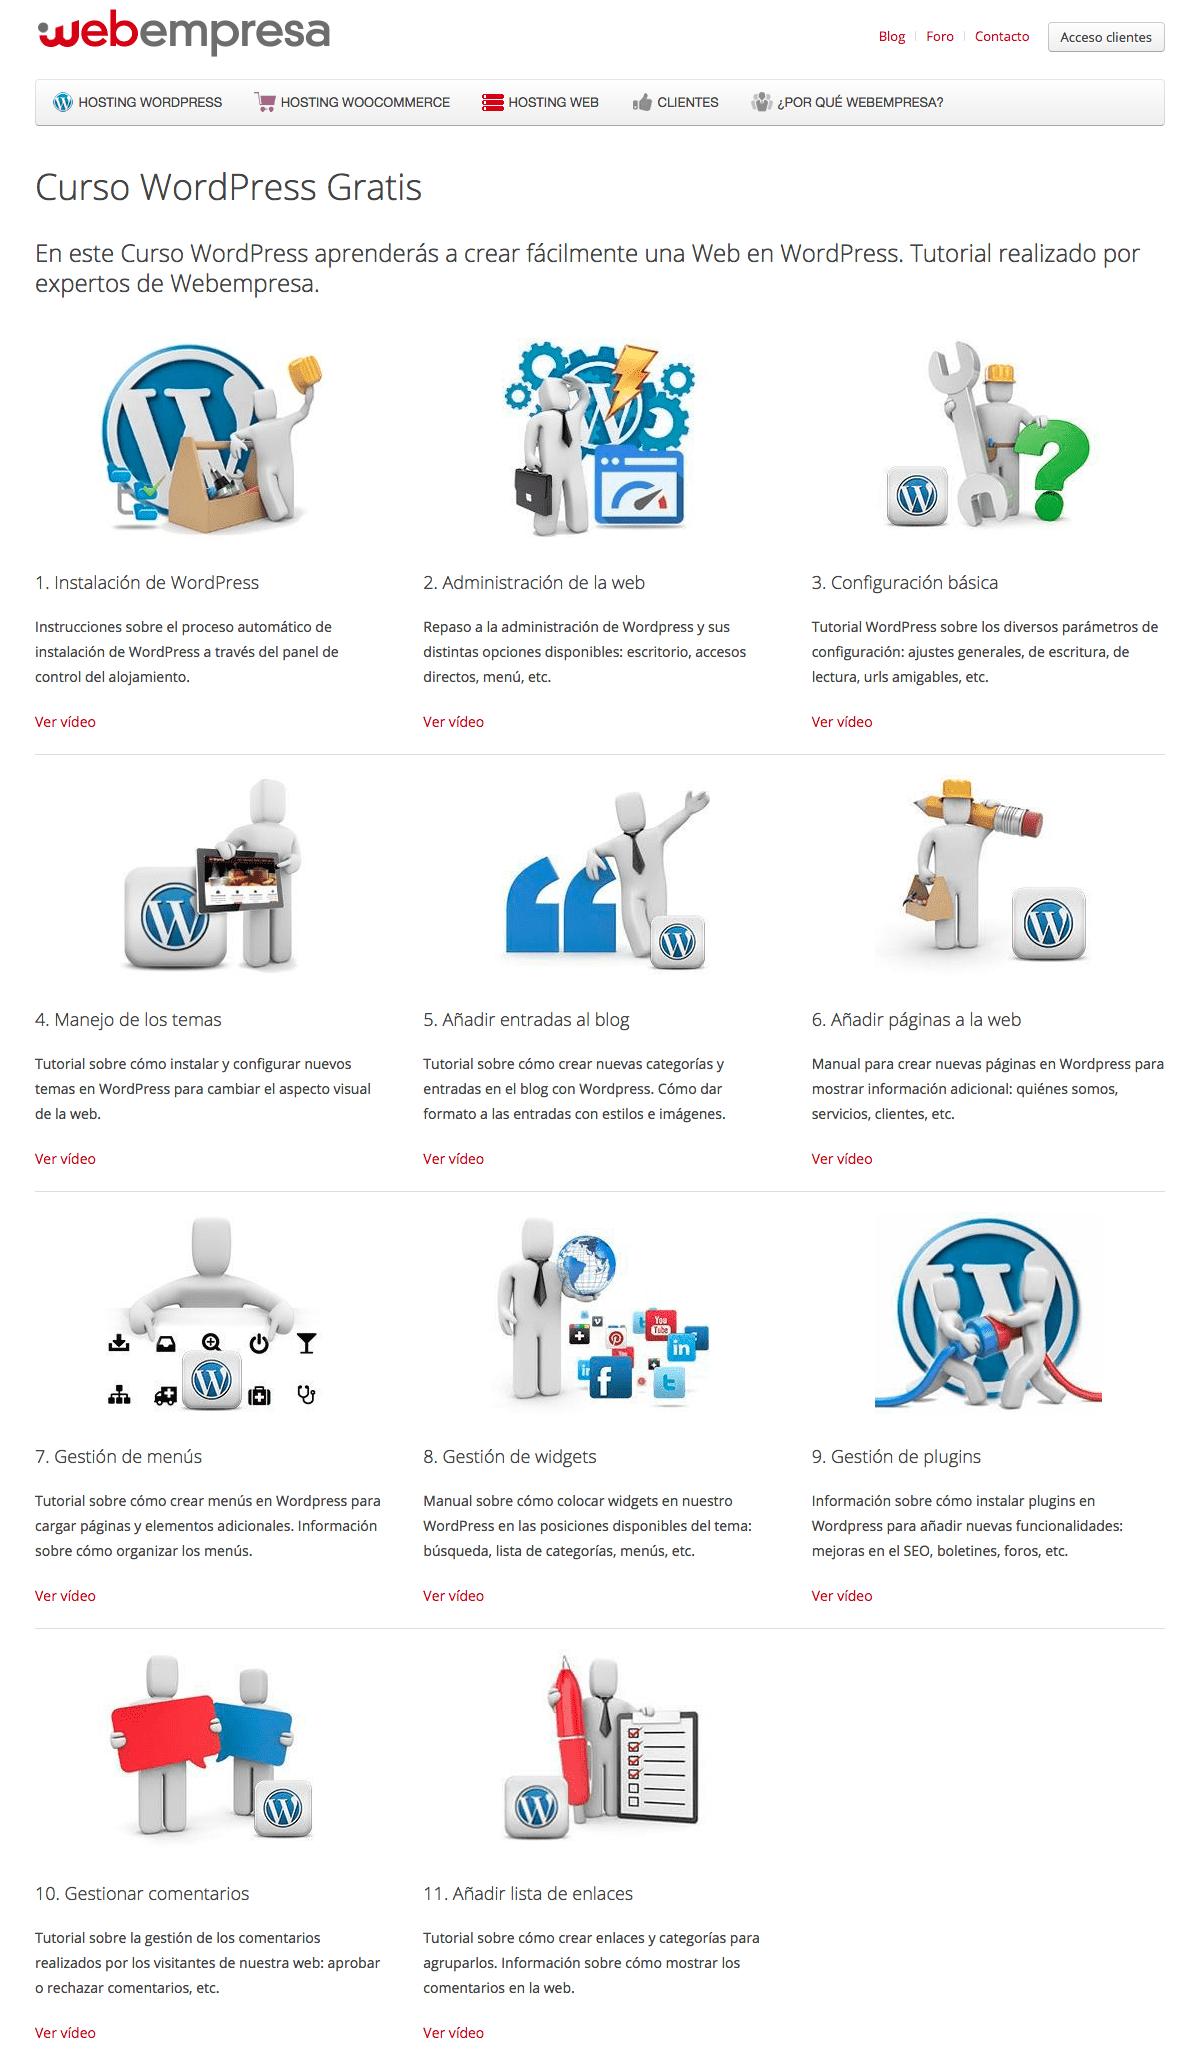 Cursos gratis de WordPress ofrecidos por webempresa.